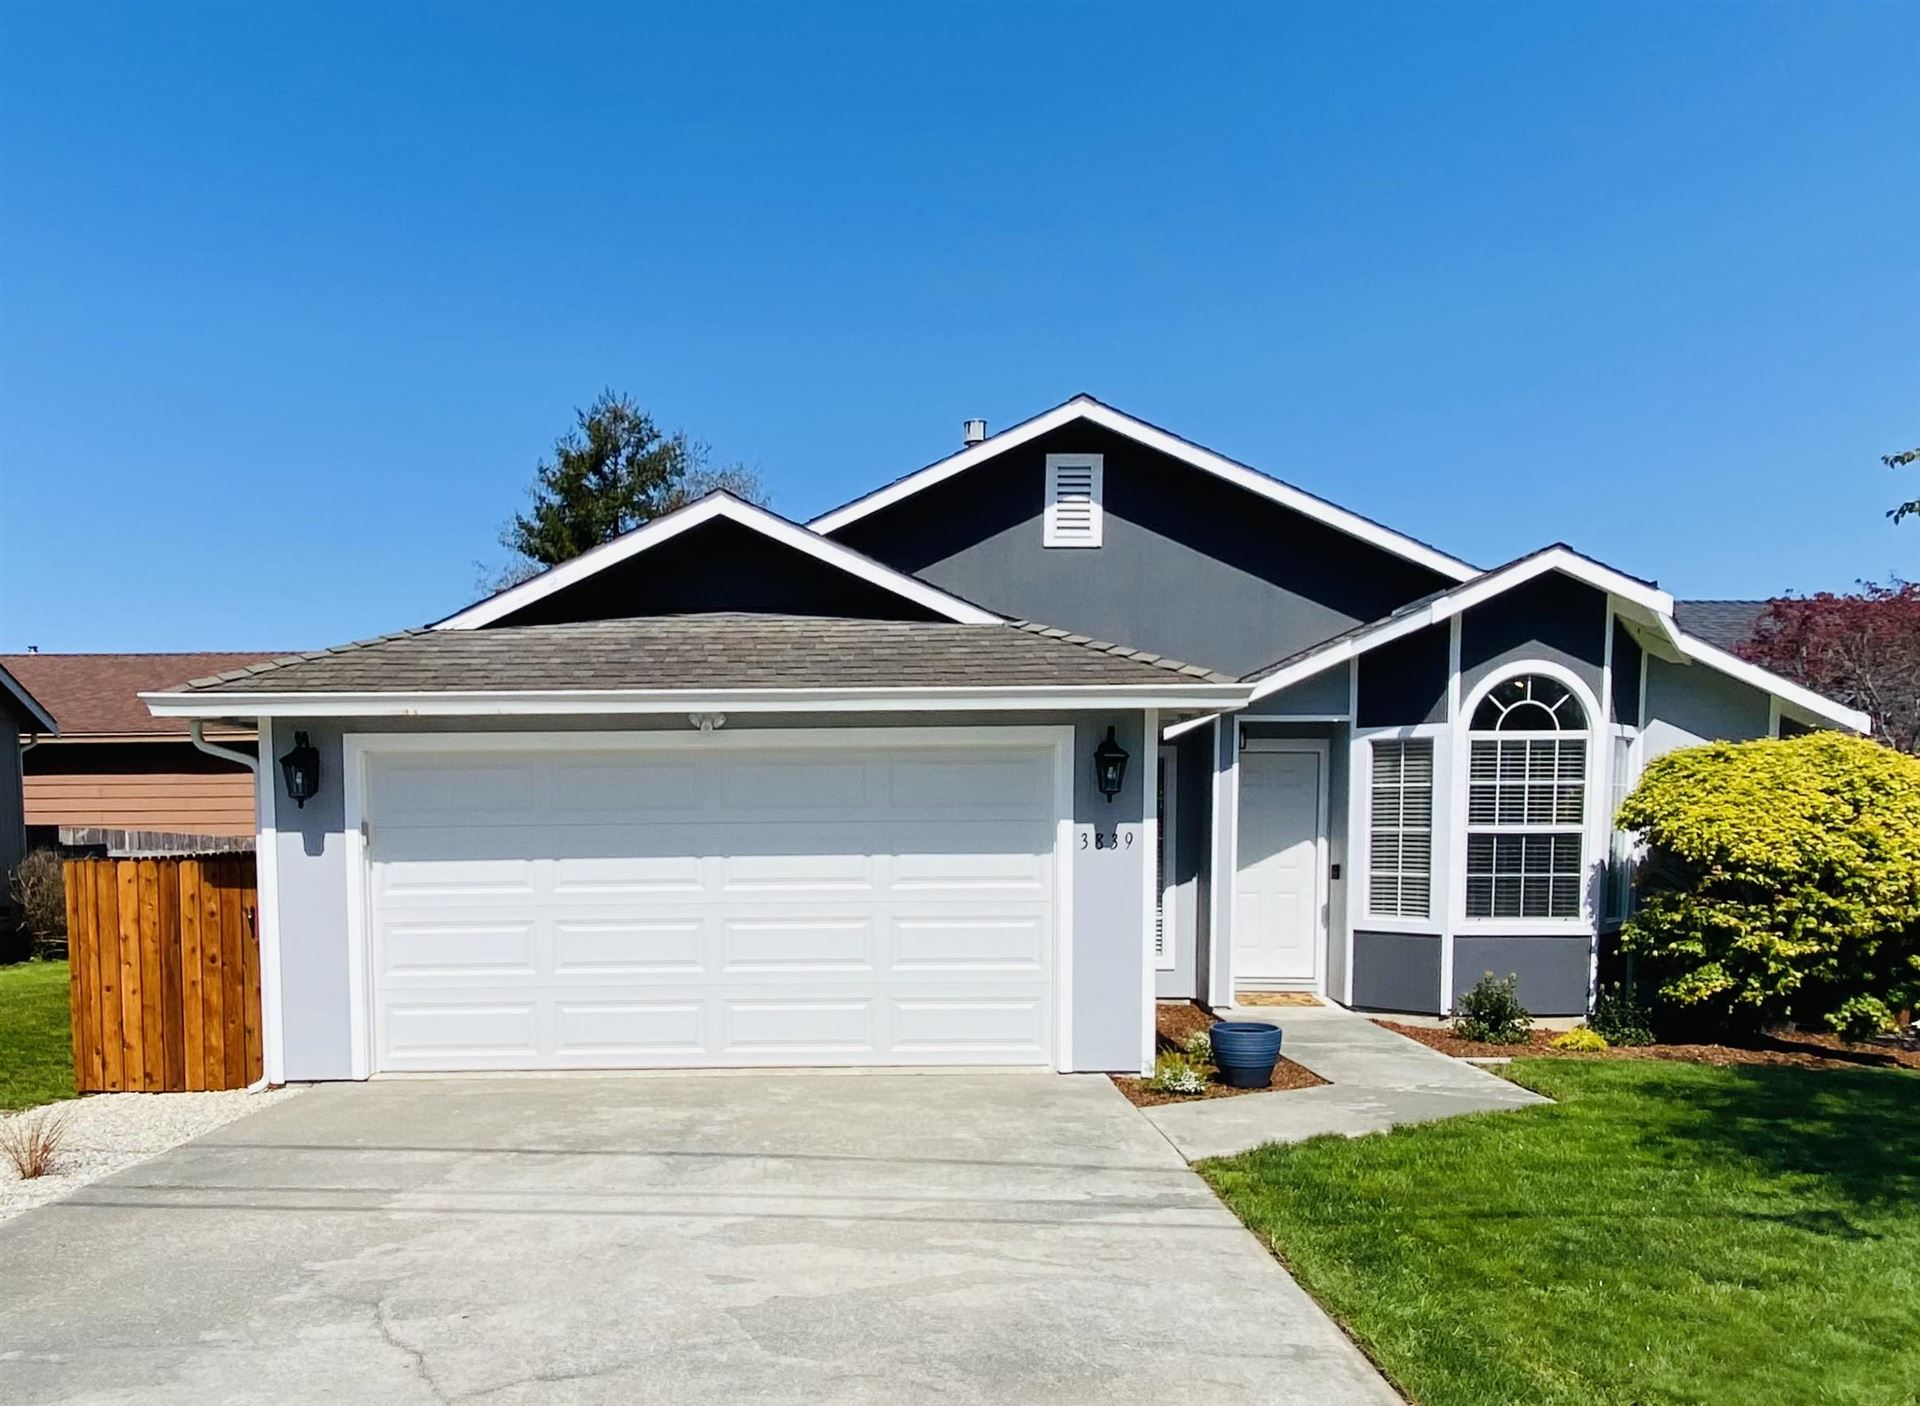 3839 Glenwood Street, Eureka, CA 95501 - MLS#: 258720